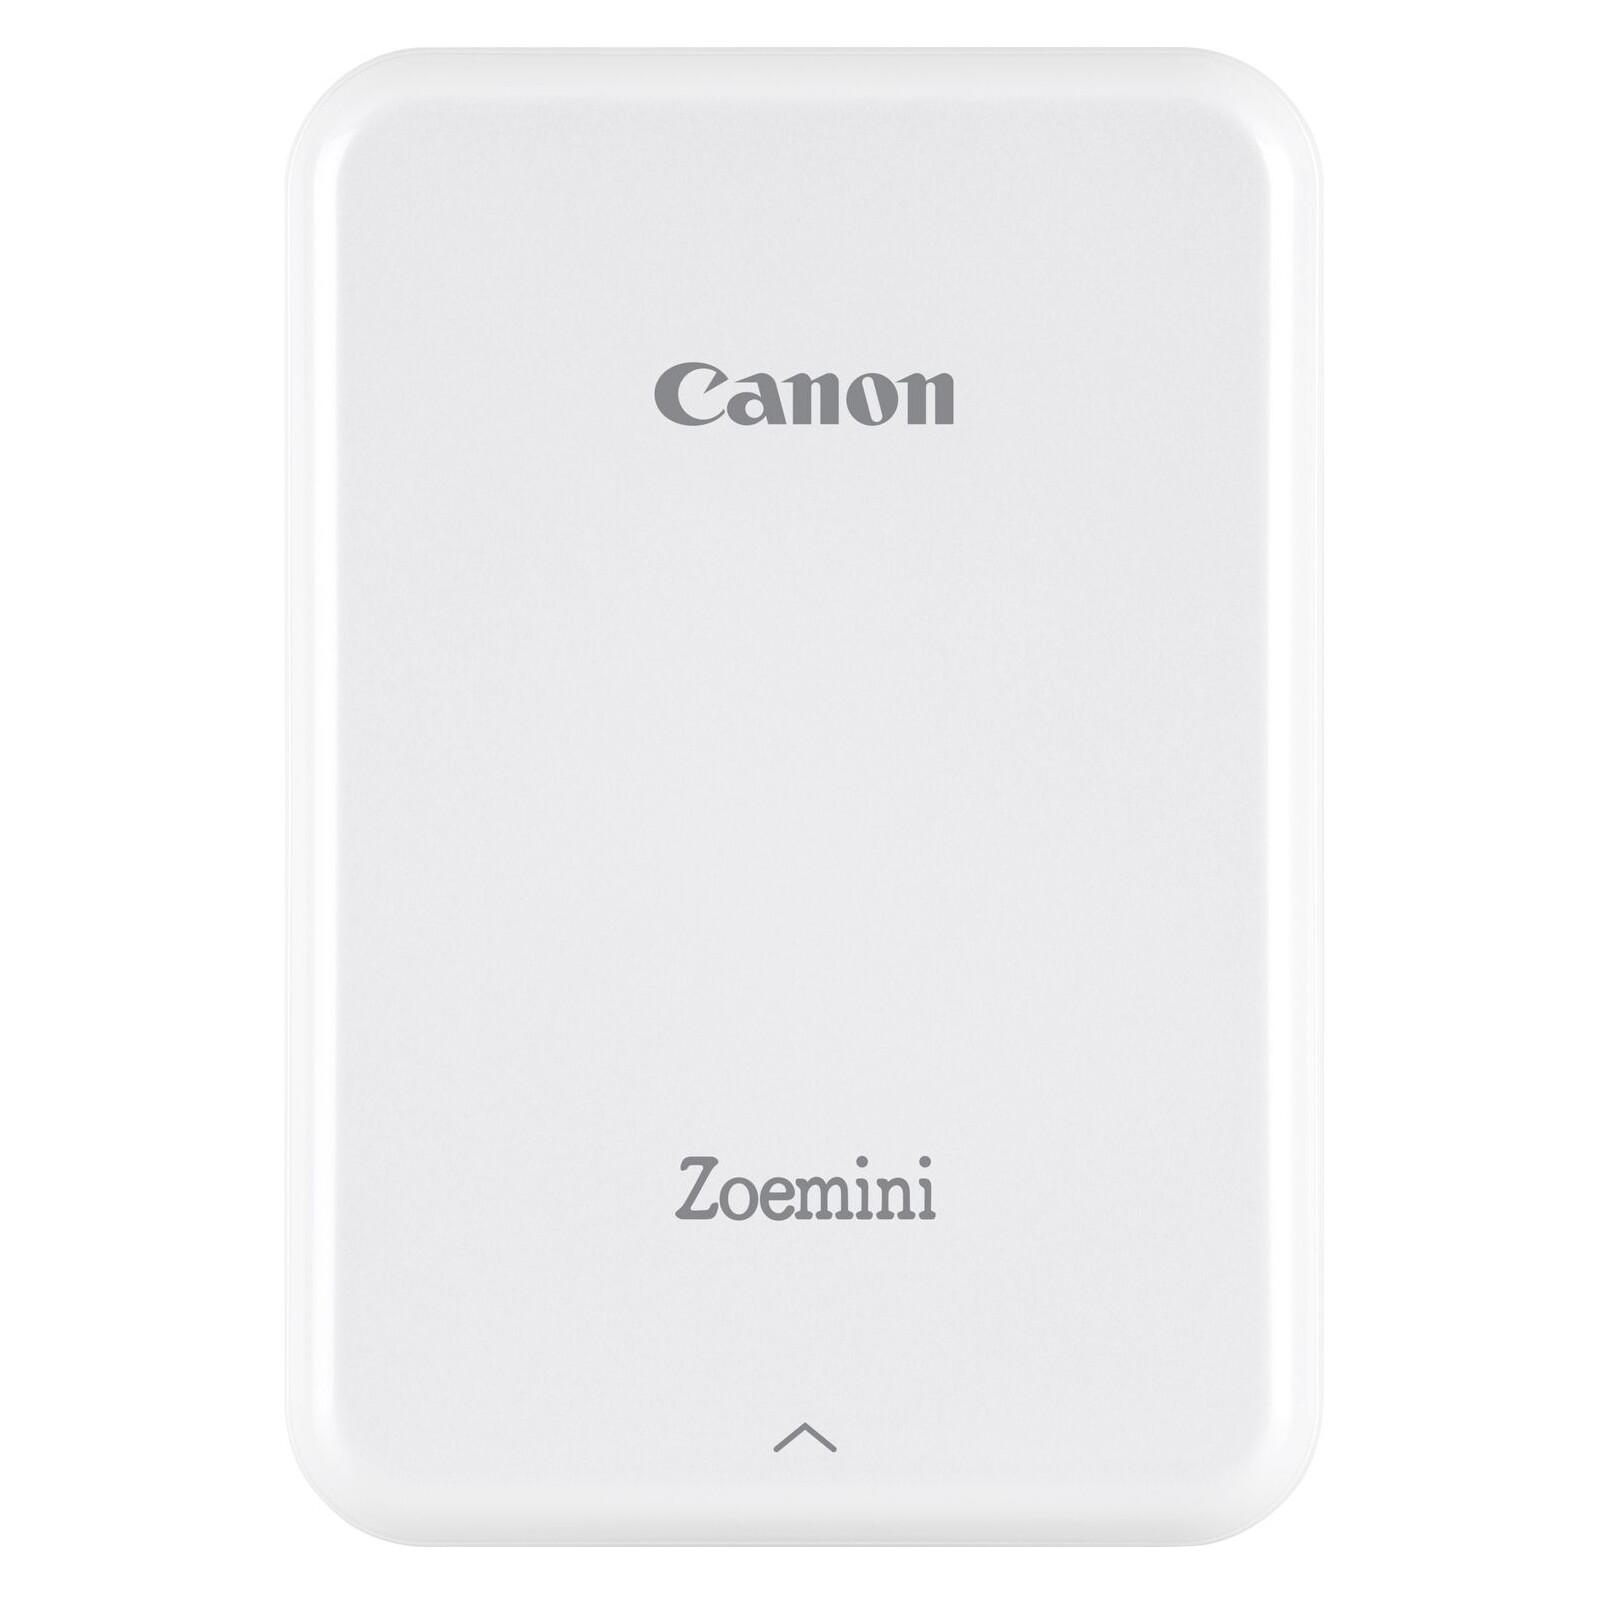 Canon Zoemini Fotodrucker Weiß